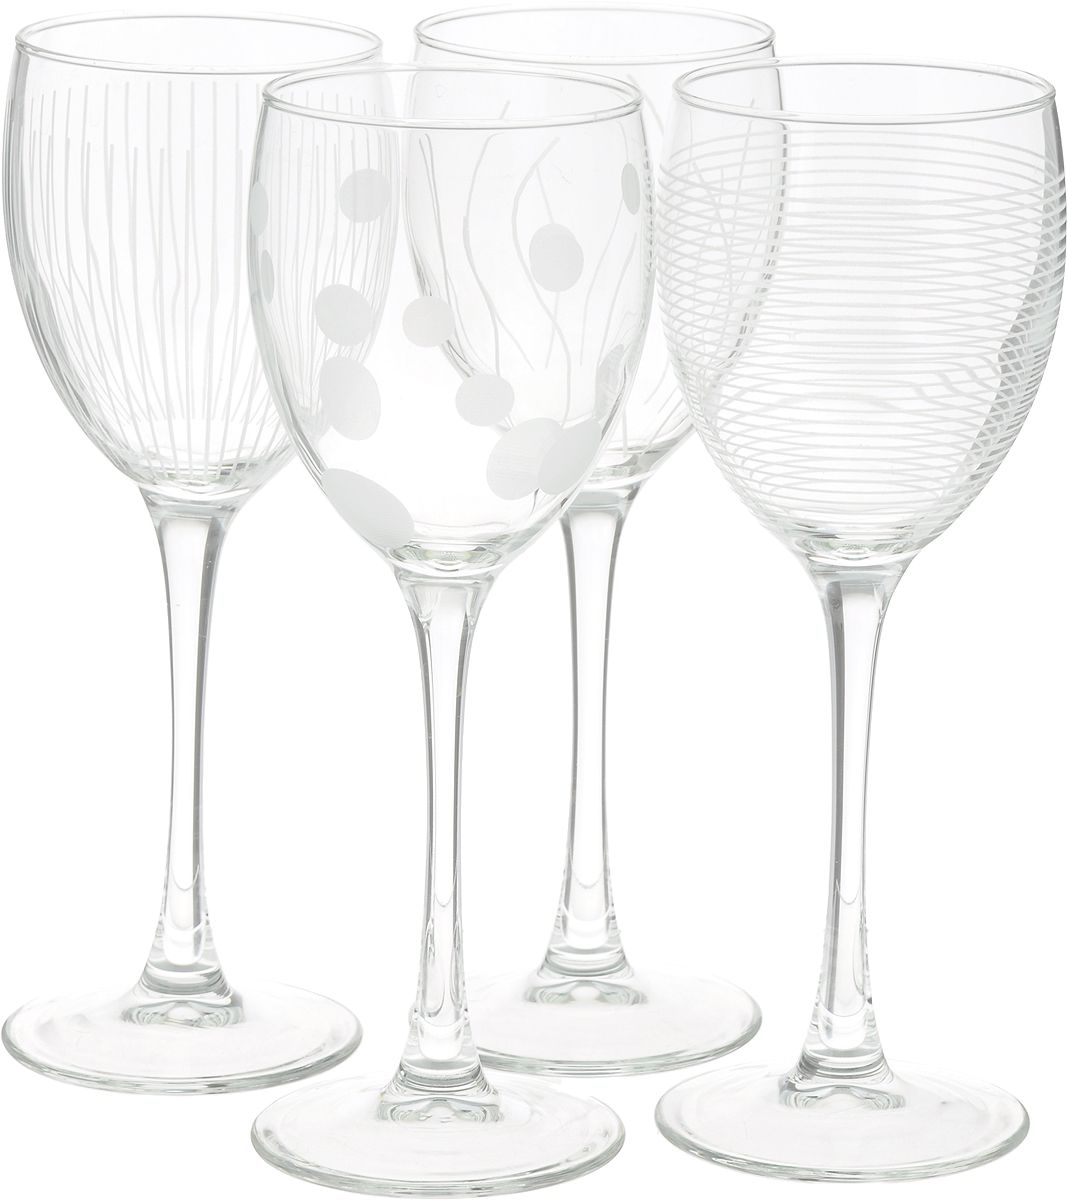 Набор фужеров для вина ОСЗ Лаунж Клаб, 250 мл, 4 шт 4sis лаунж зона лабро